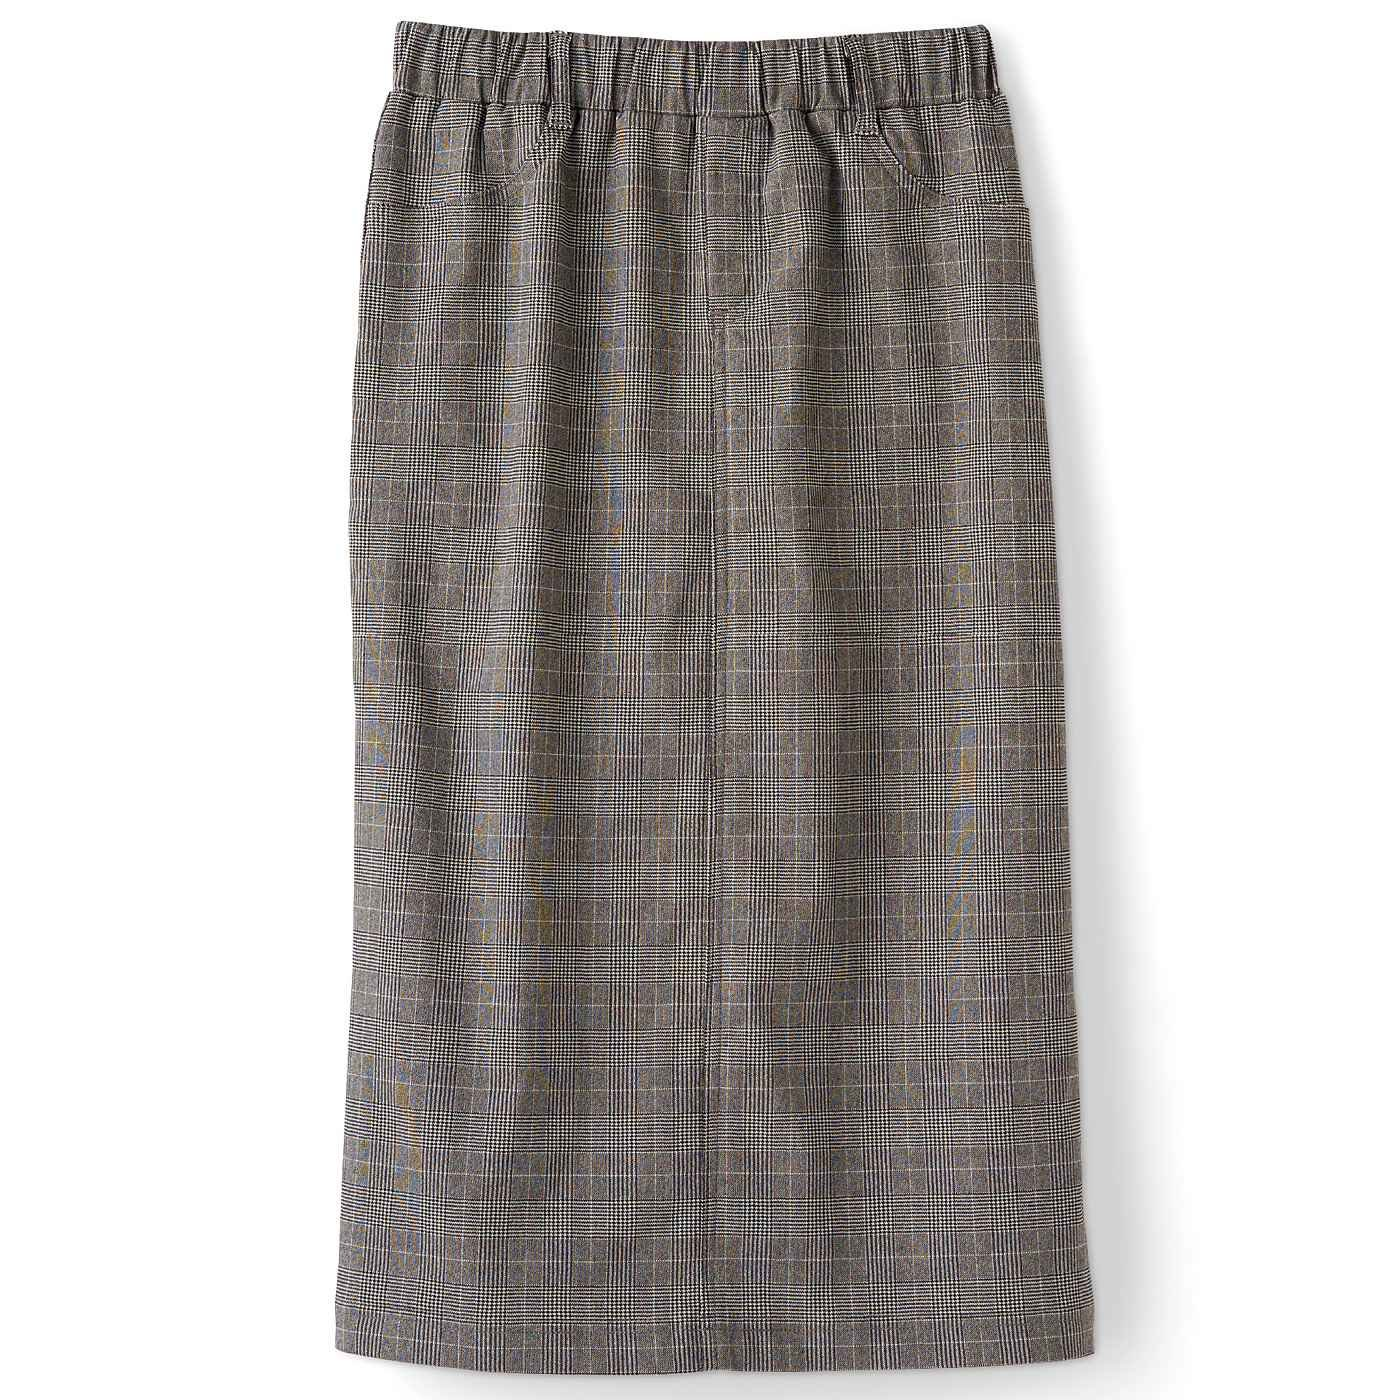 DRECO by IEDIT 裏起毛グレンチェックナロースカート〈チャコールグレー〉